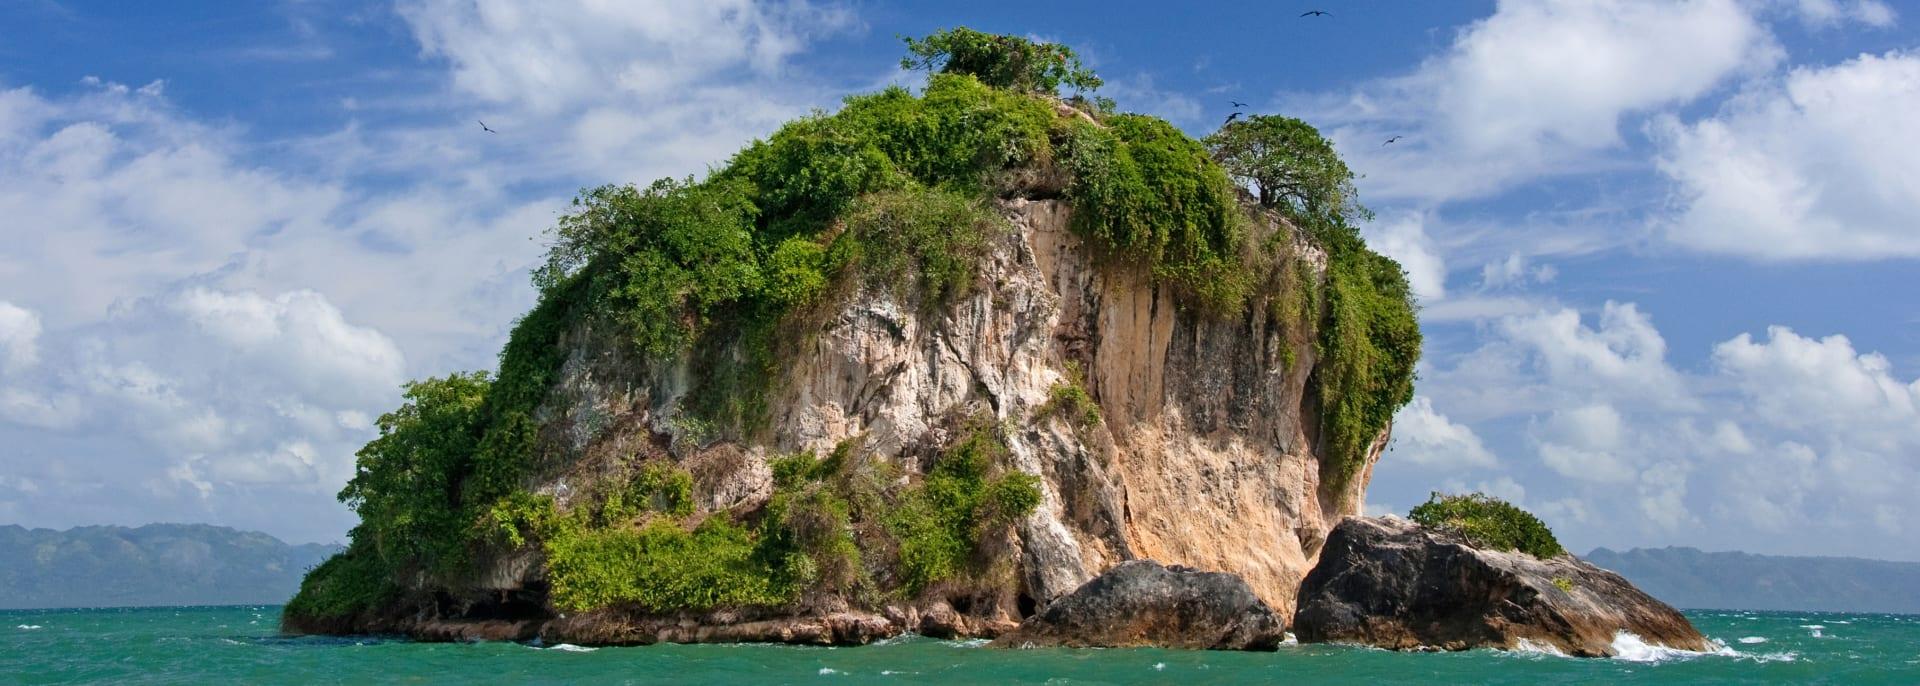 Los Haitises Nationalpark, Vogelinsel, Dominikanische Republik